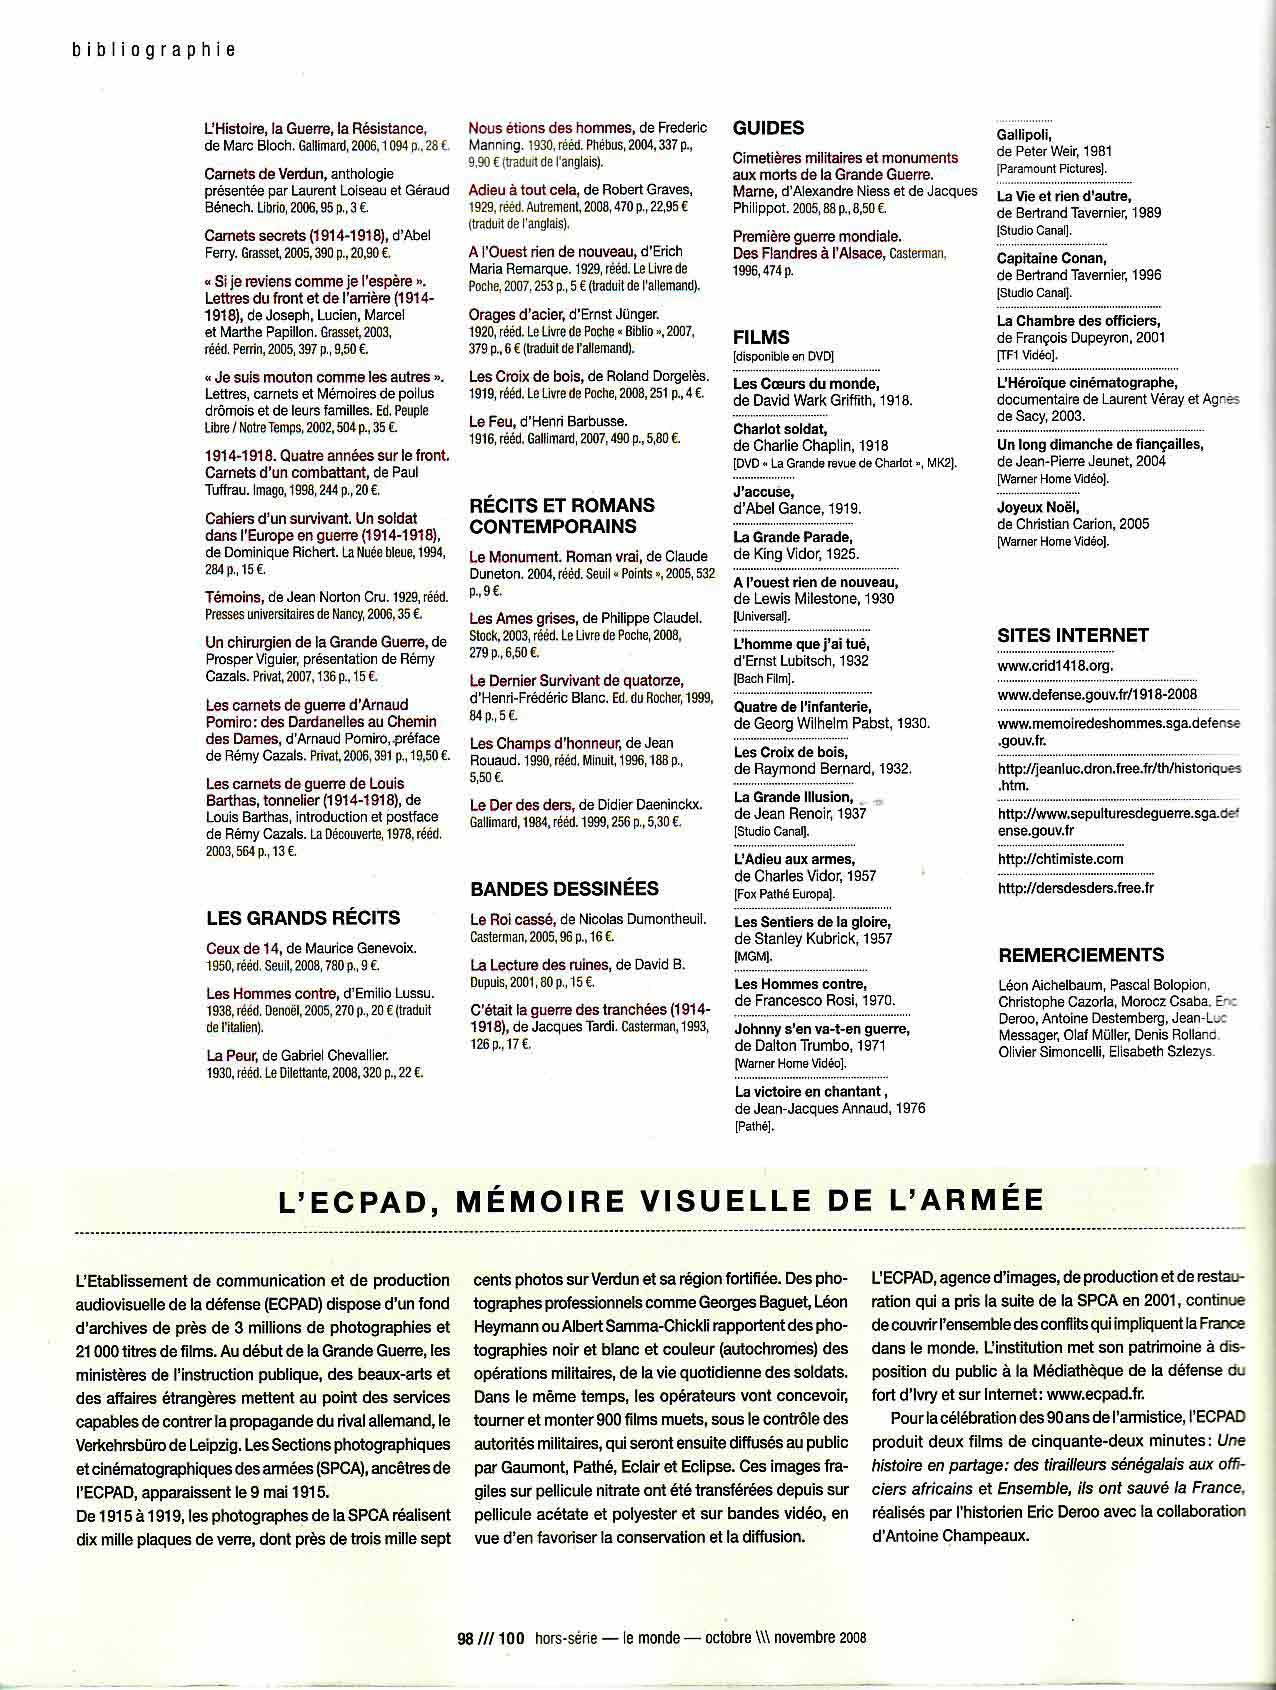 le-monde-14-page